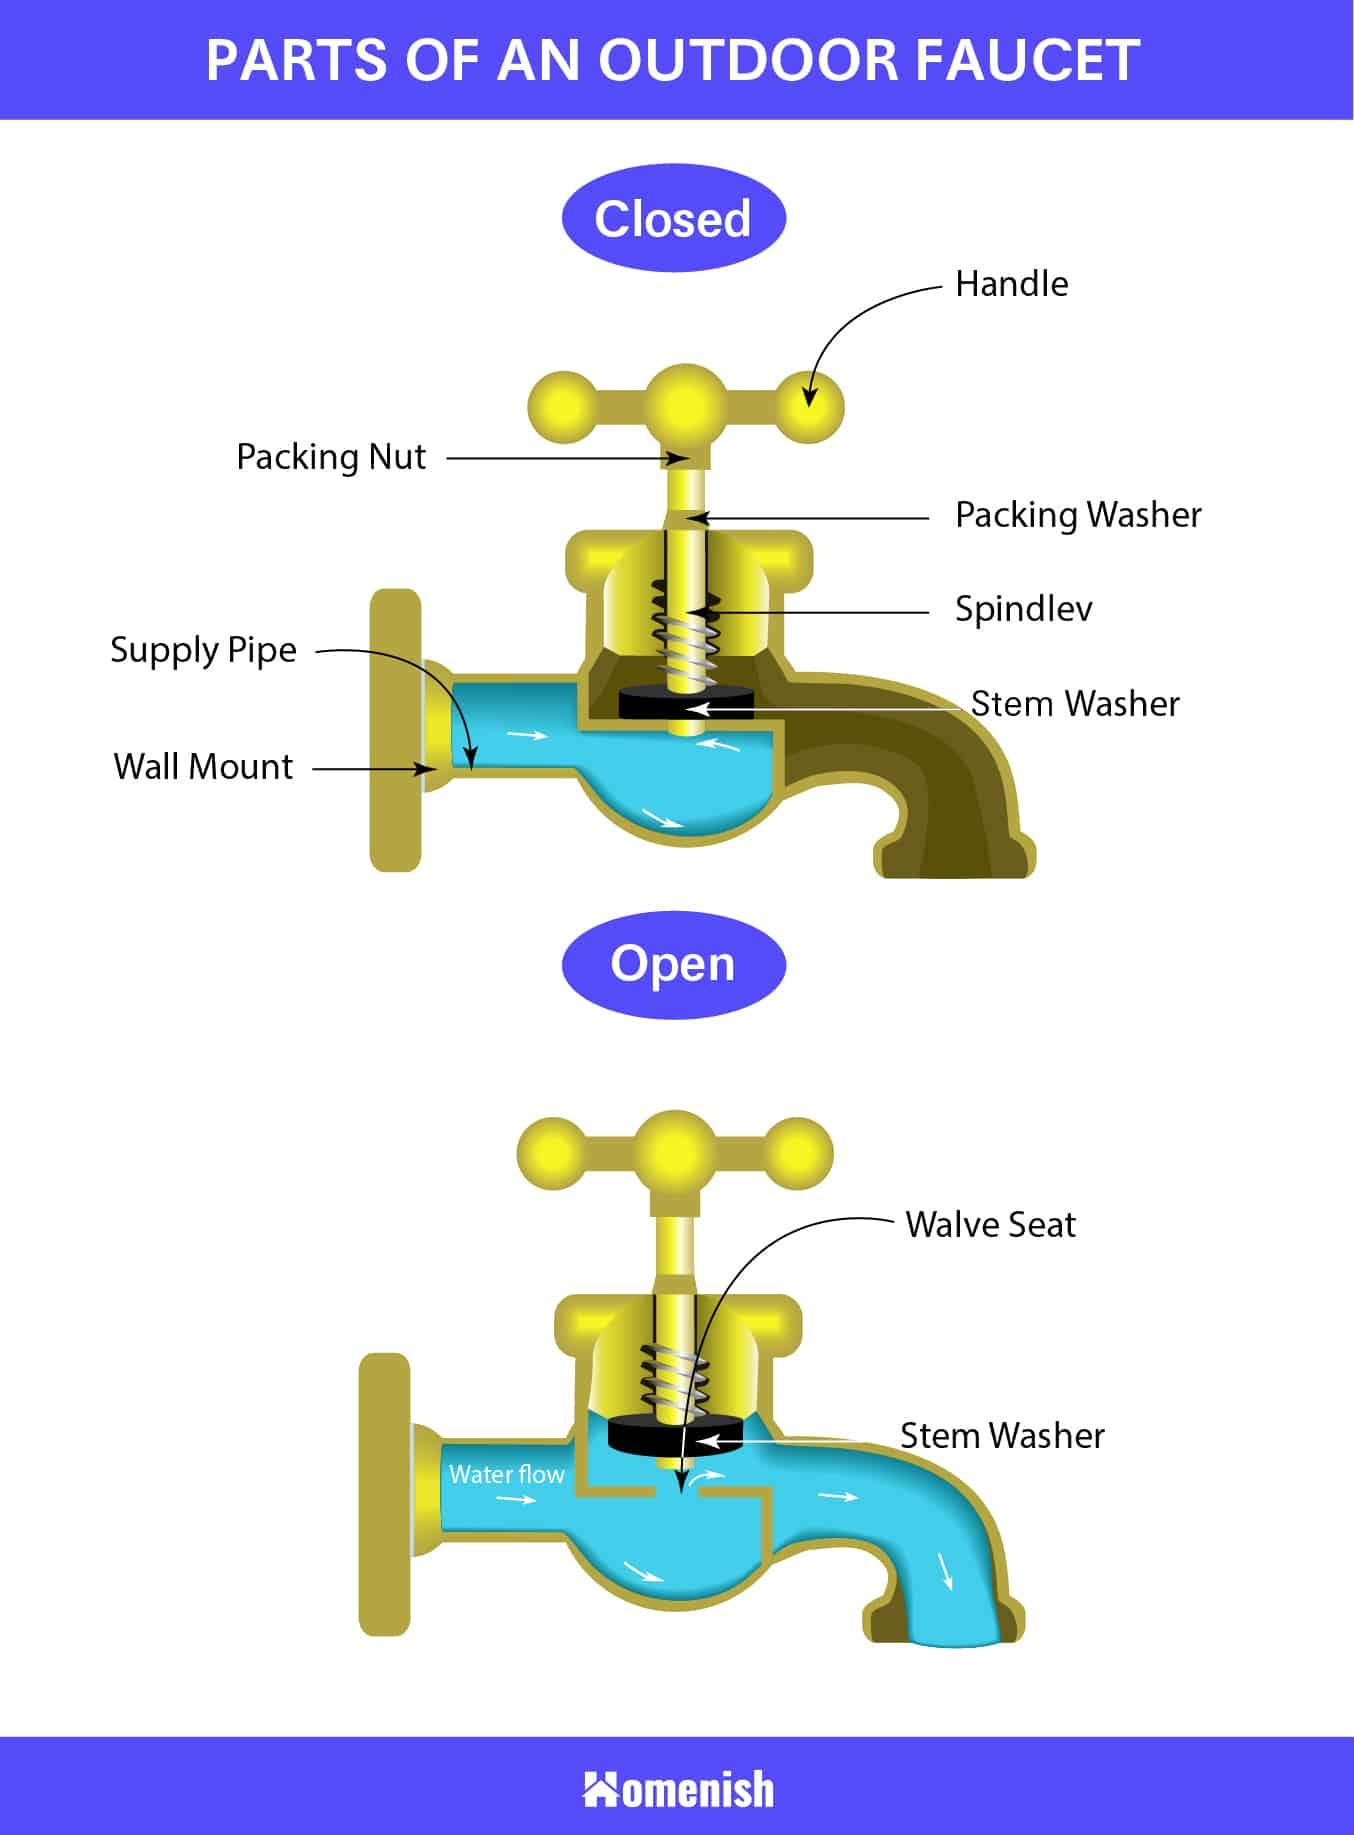 Parts of an Outdoor Faucet Diagram